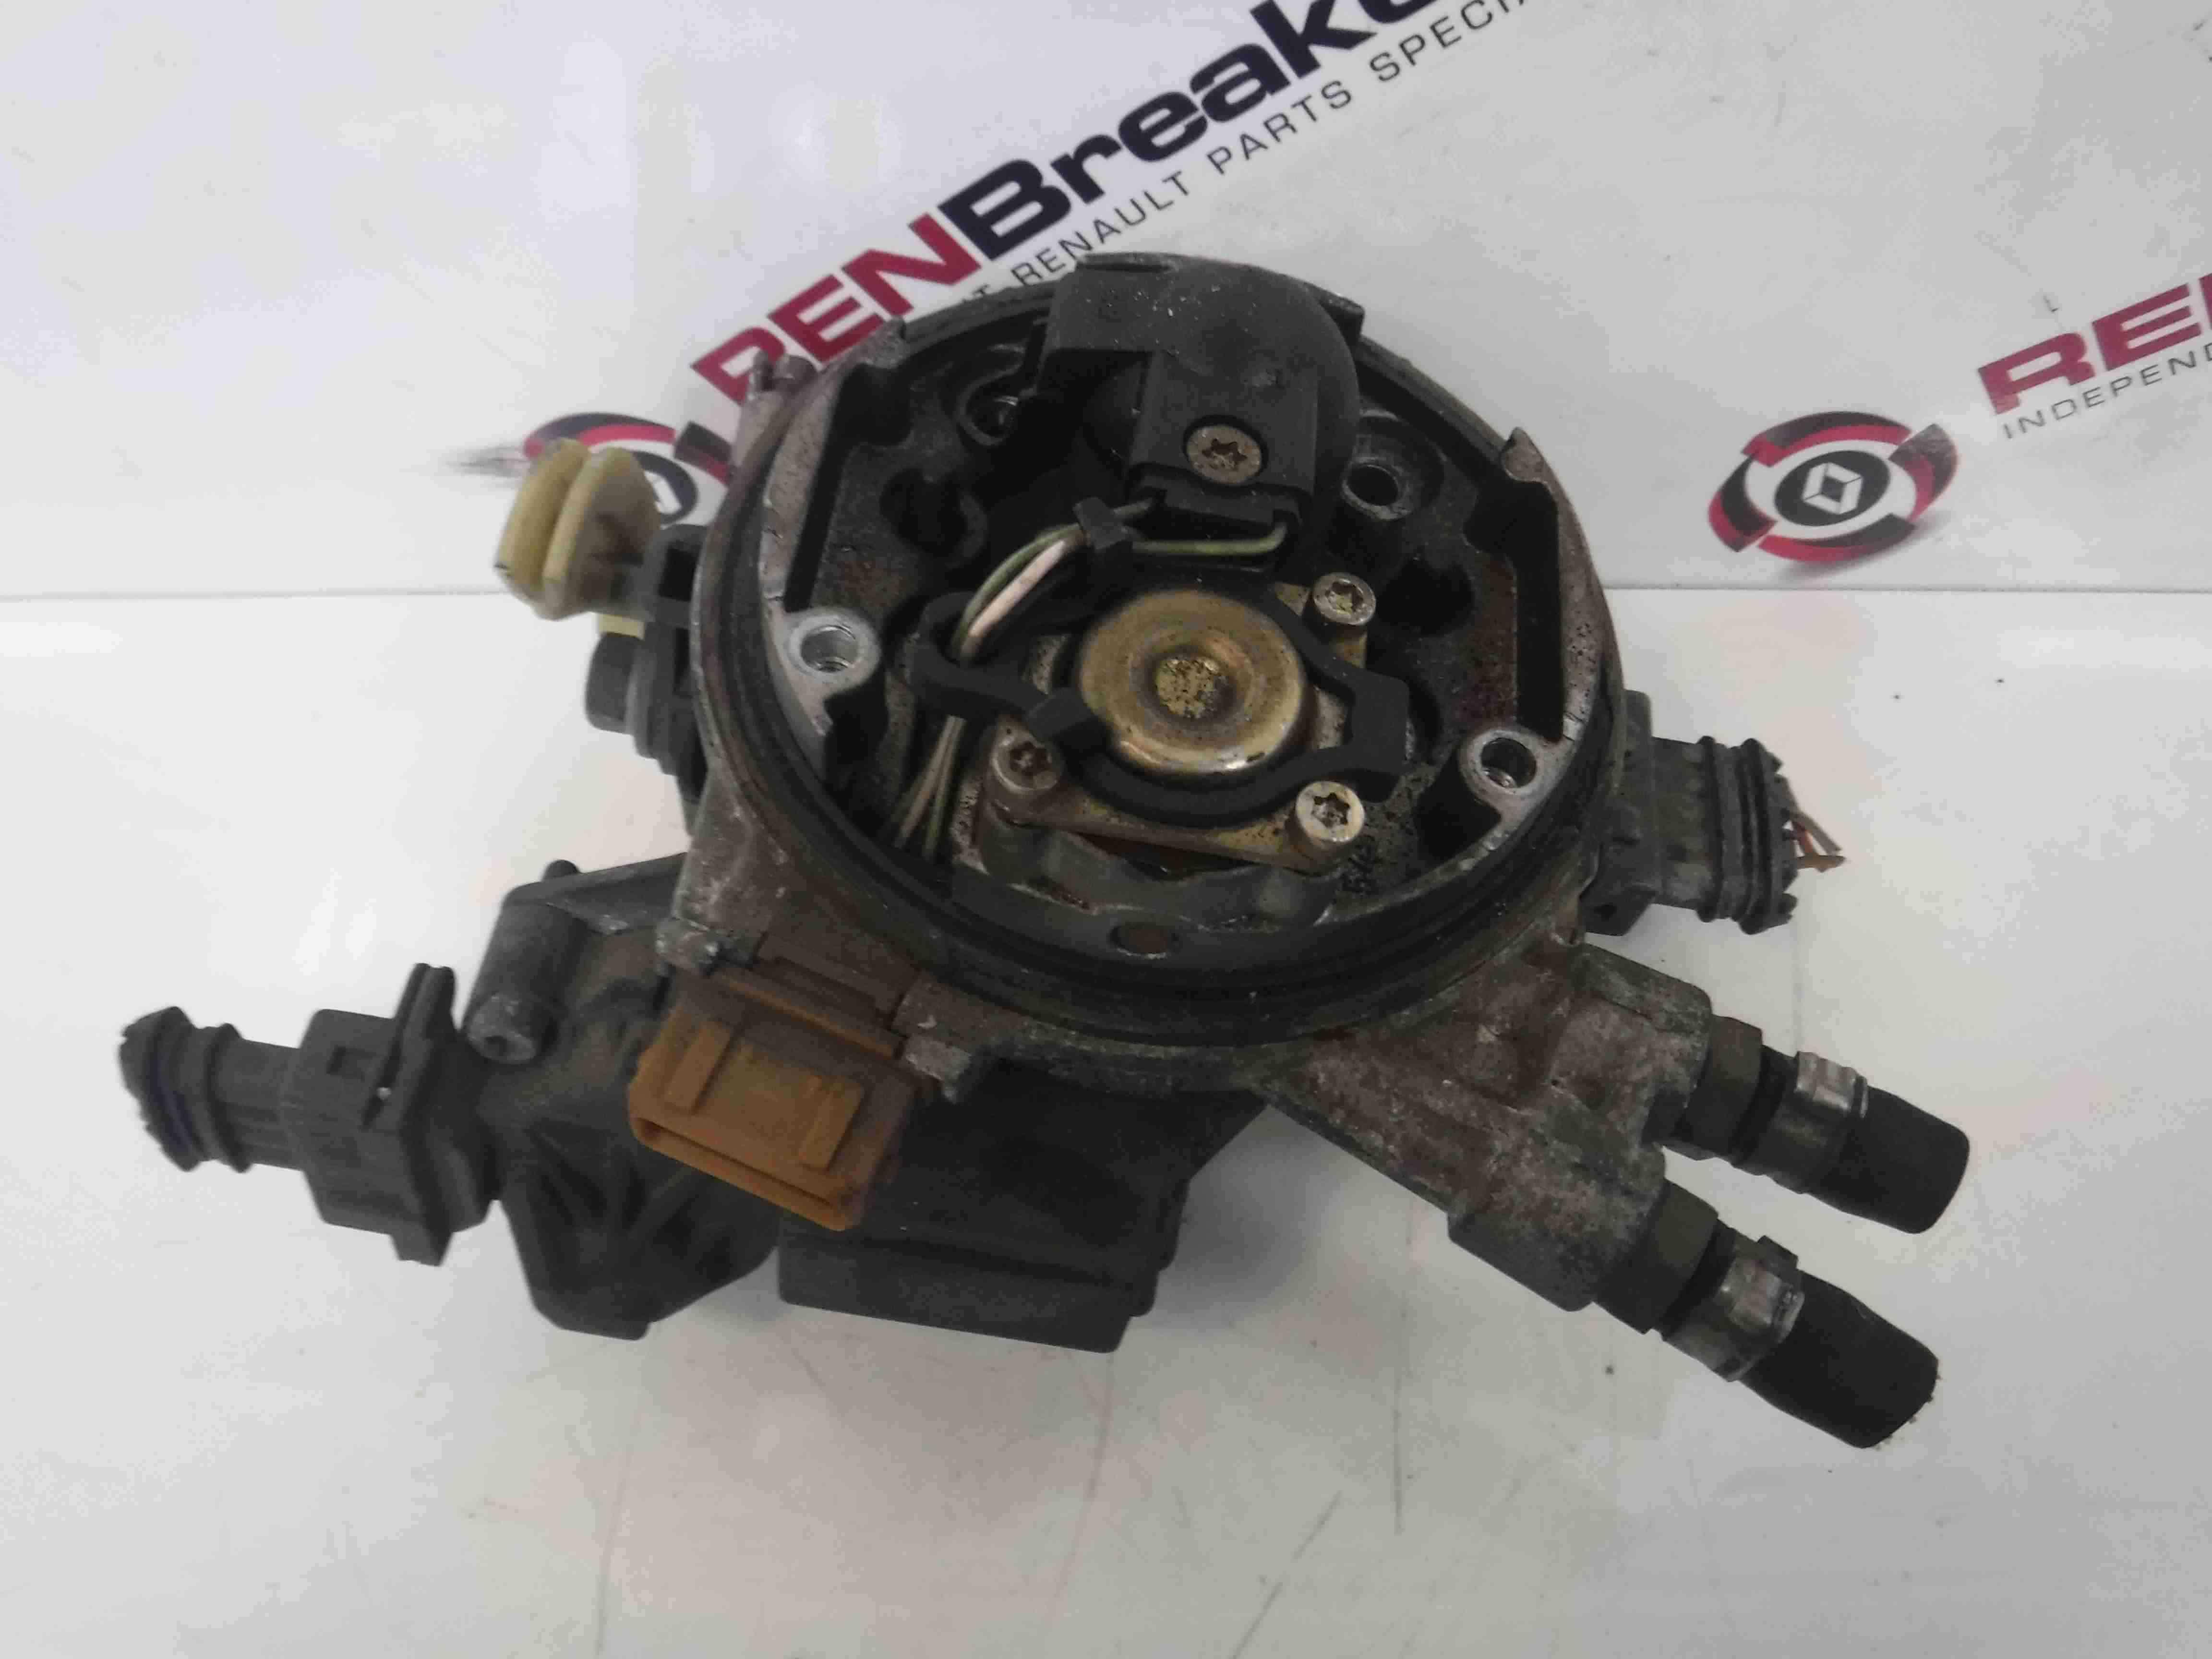 Renault Clio MK1 1990-1998 1.4 8v Throttle Body E7J 3435201562